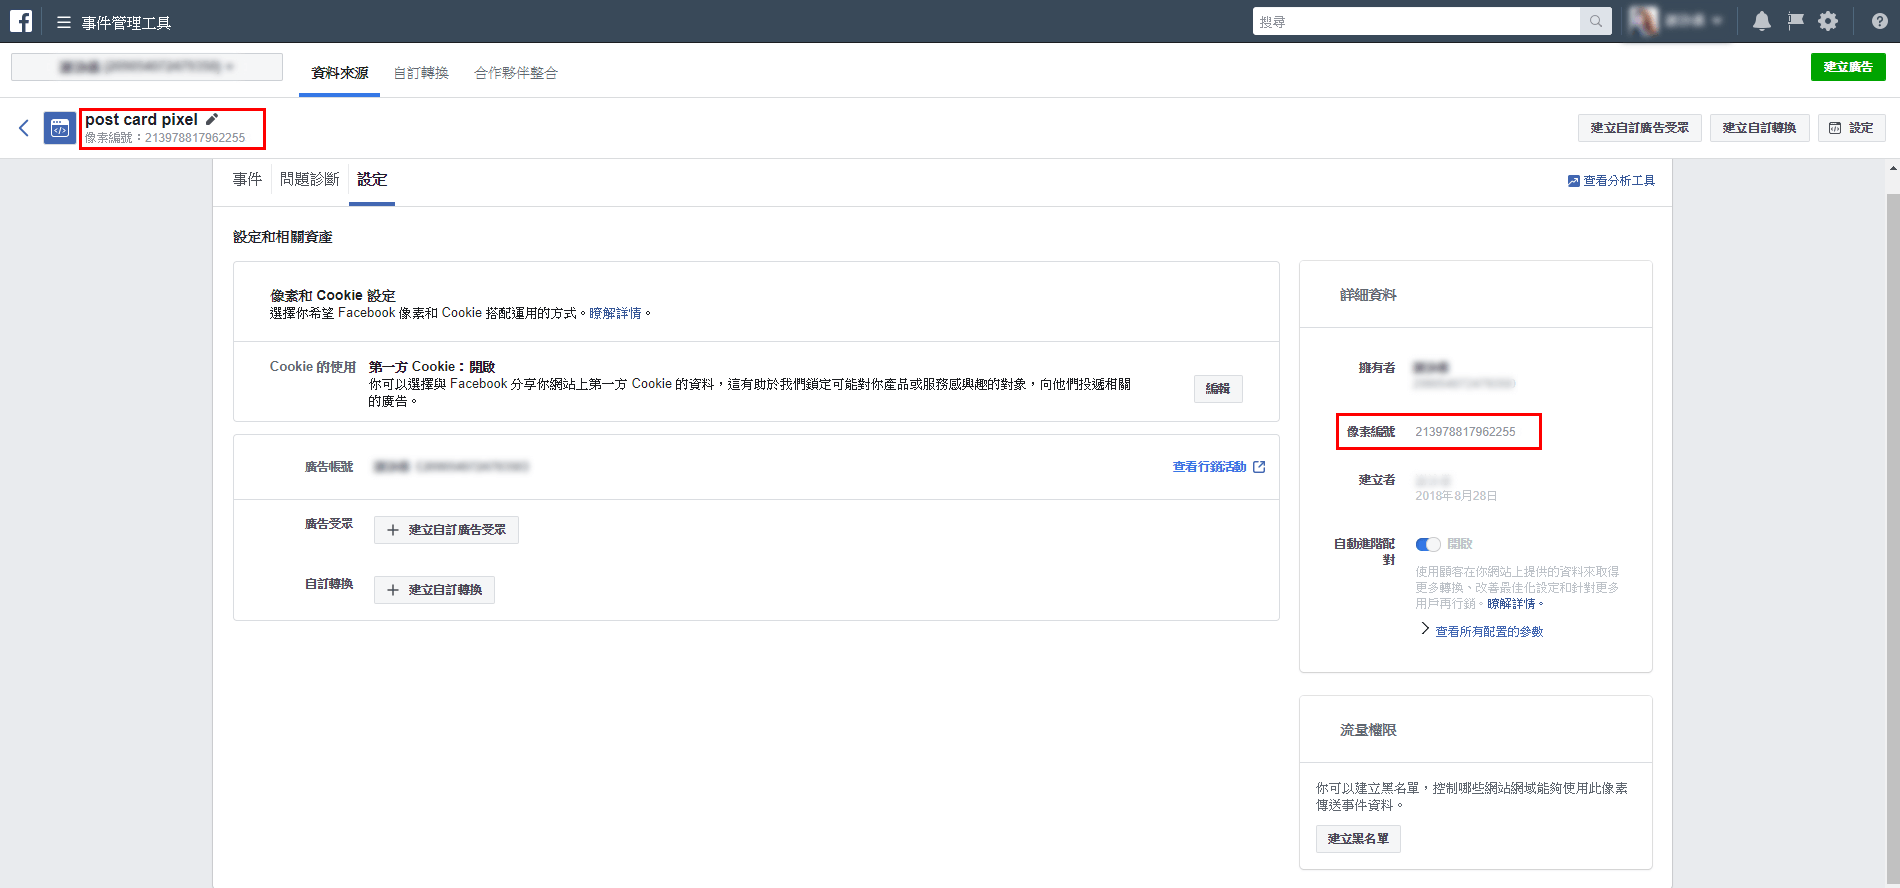 Facebook Pixel 像素追蹤 查詢像素編號